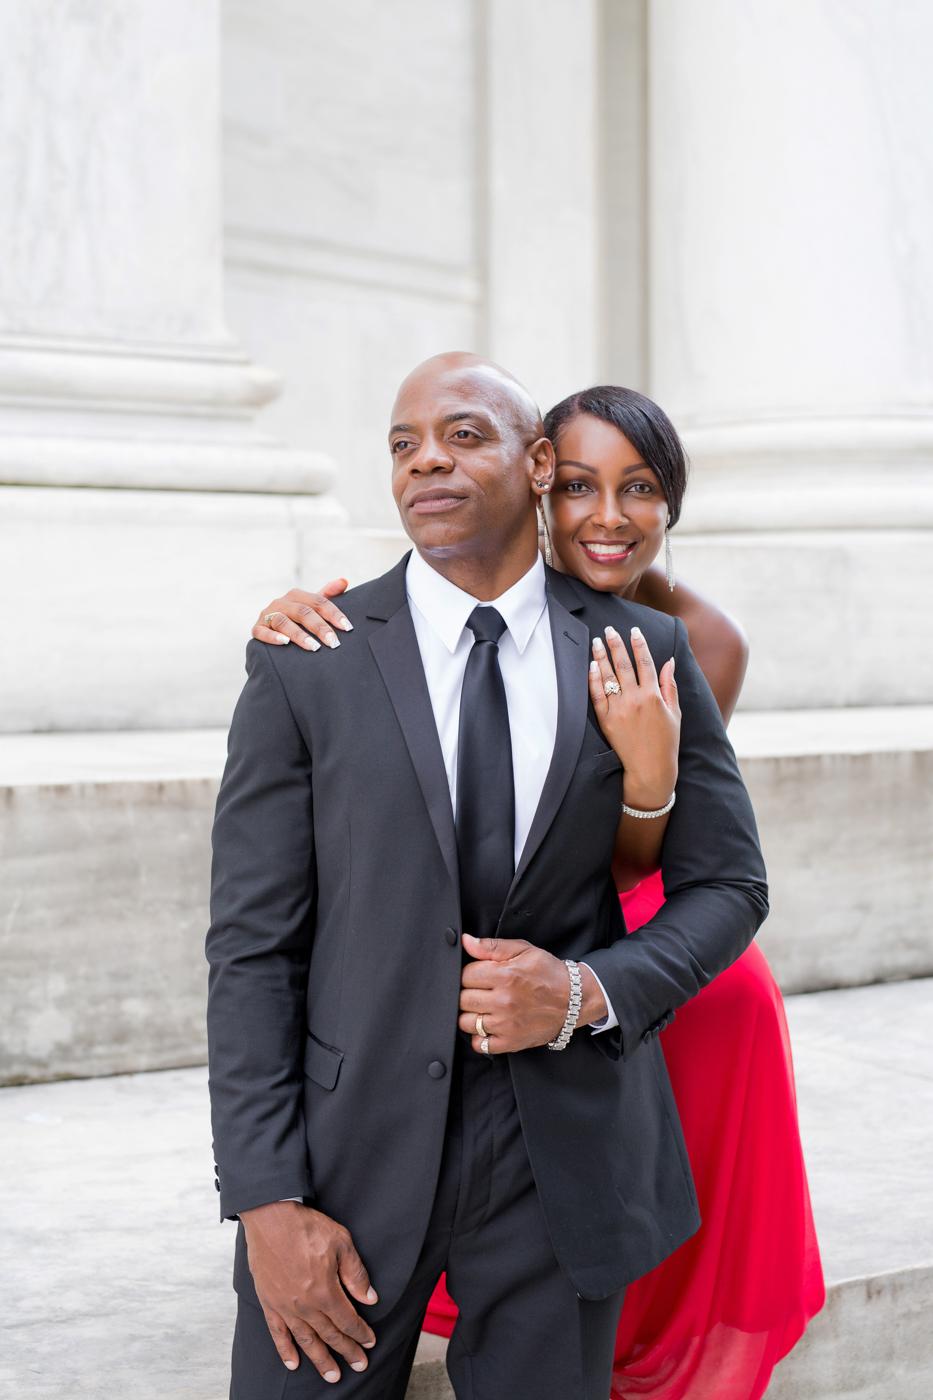 wedding-anniversary-photo-shoot-in-washington-dc-ksenia-pro-photography-32